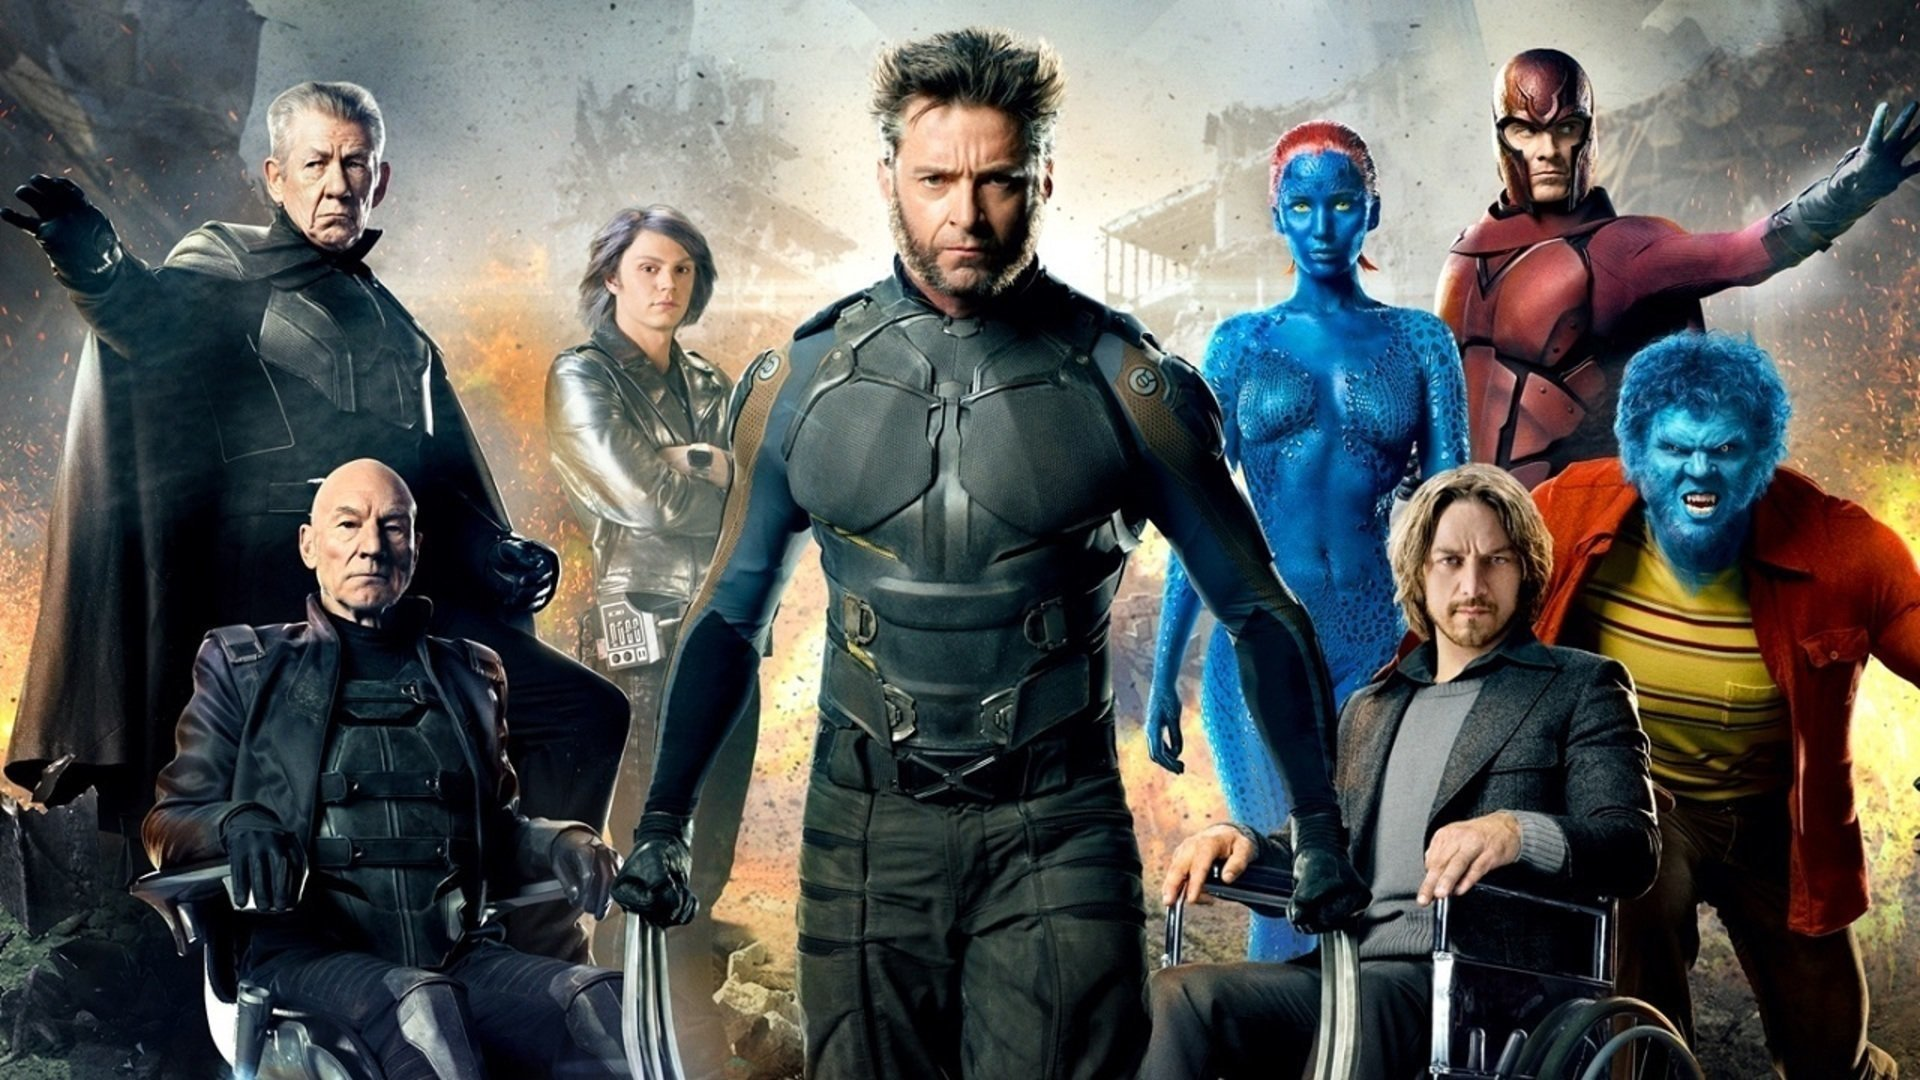 X Men Days Of Future Past Wallpaper: X-Men: Days Of Future Past Full HD Wallpaper And